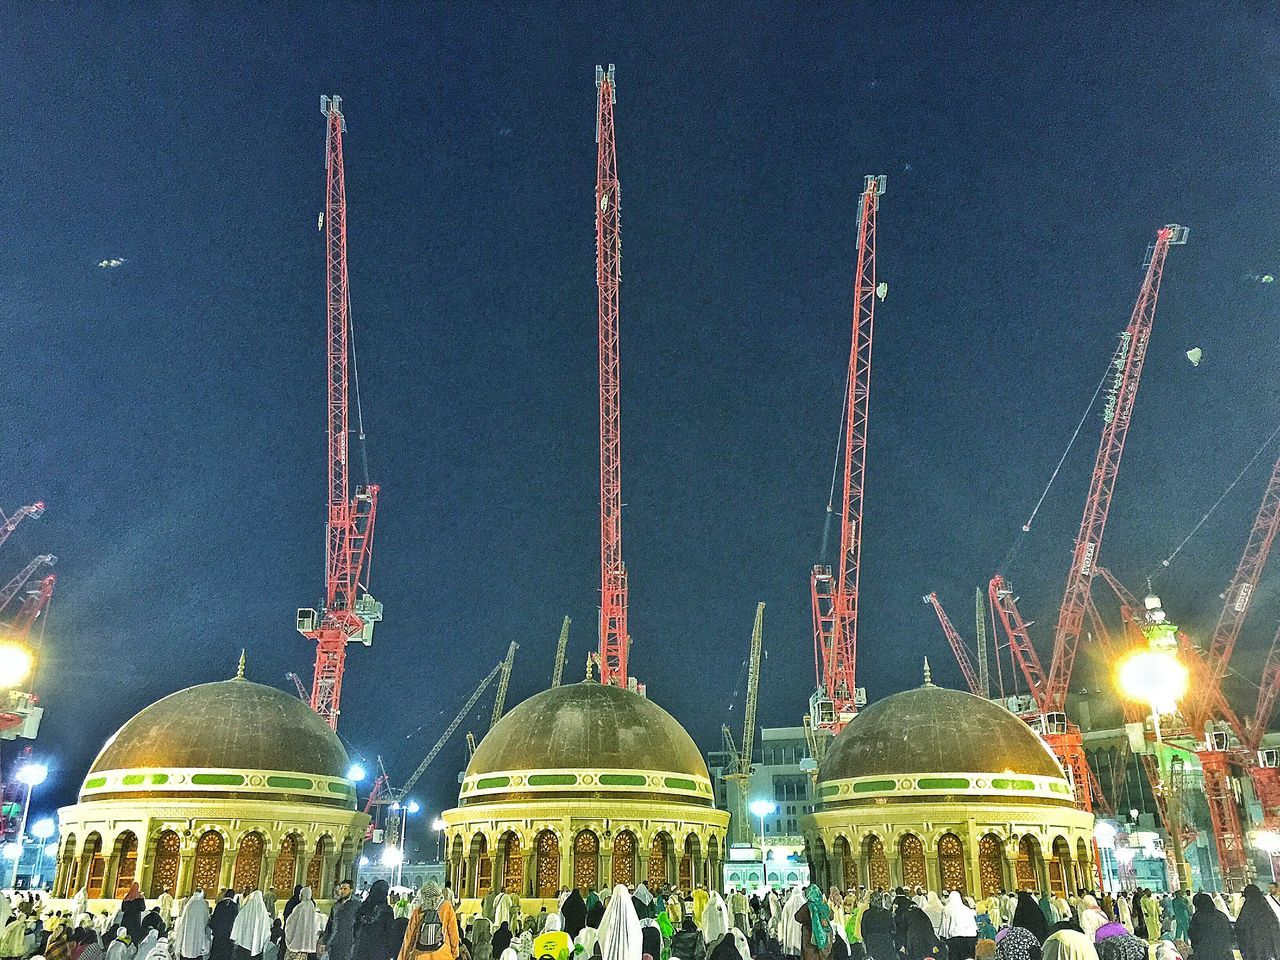 The Architect - 2016 EyeEm Awards Mosque Pray Islamic Architecture Islam Masjid Al-Haram المسجد الحرام Mecca Crane Contructionwork People